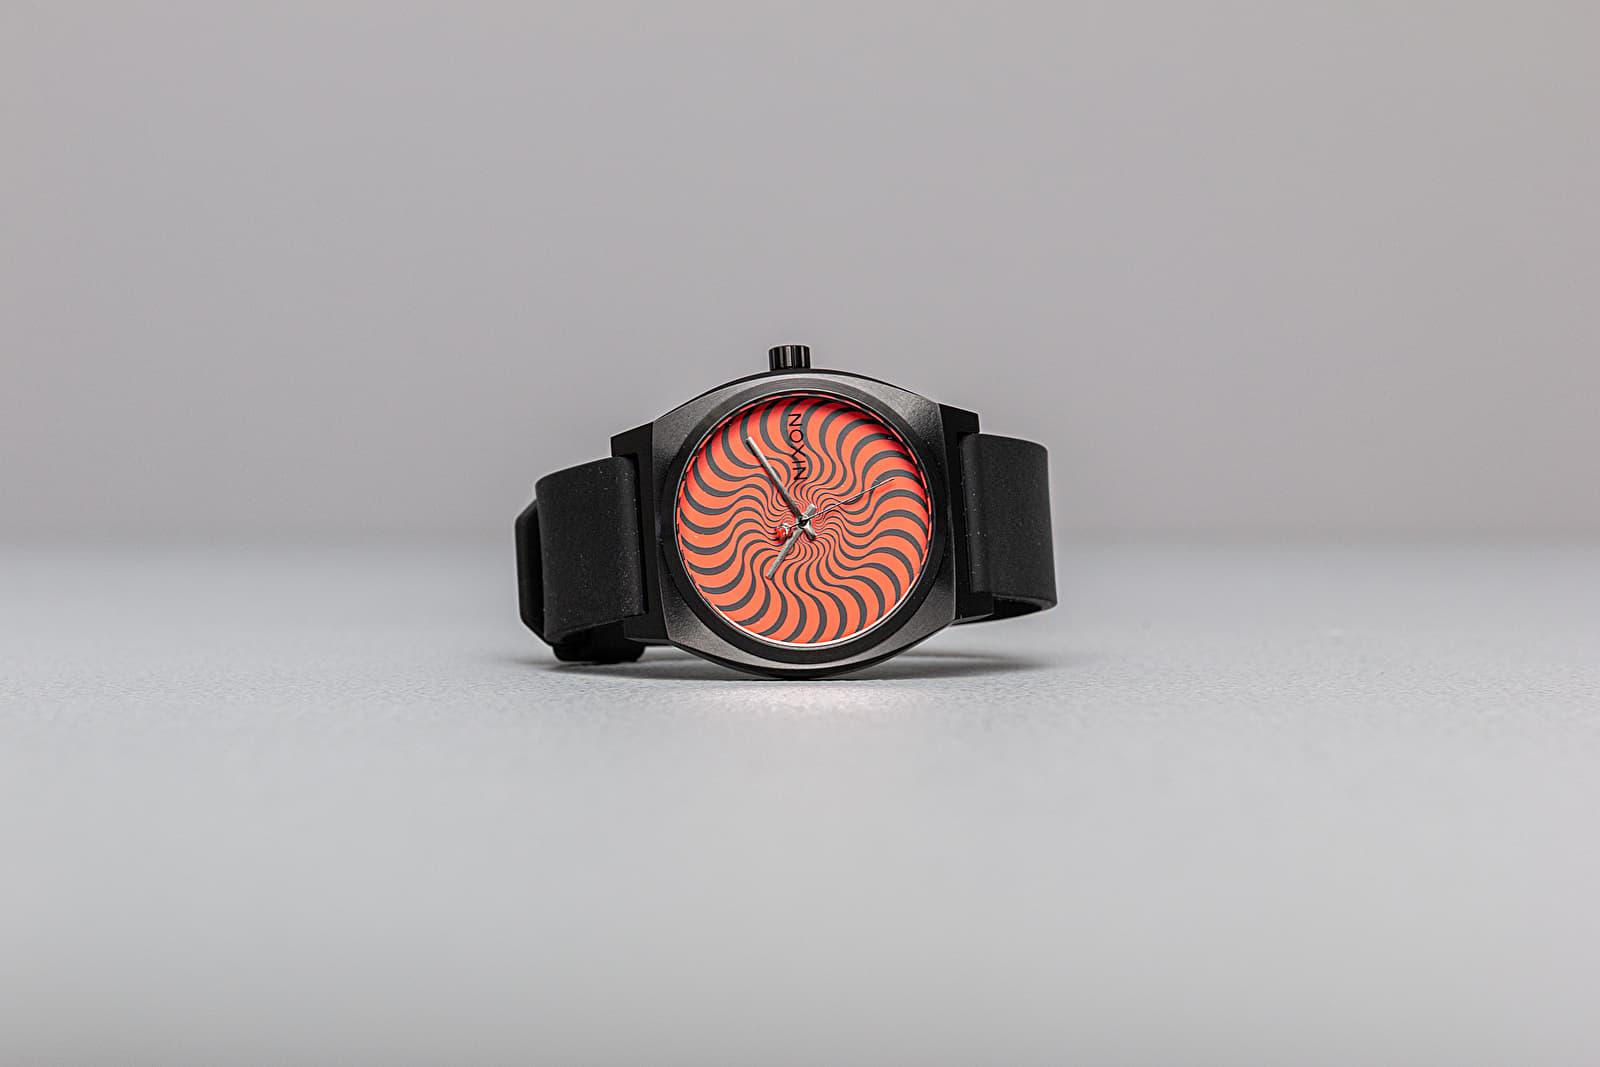 Nixon x Spitfire Time Teller Watches